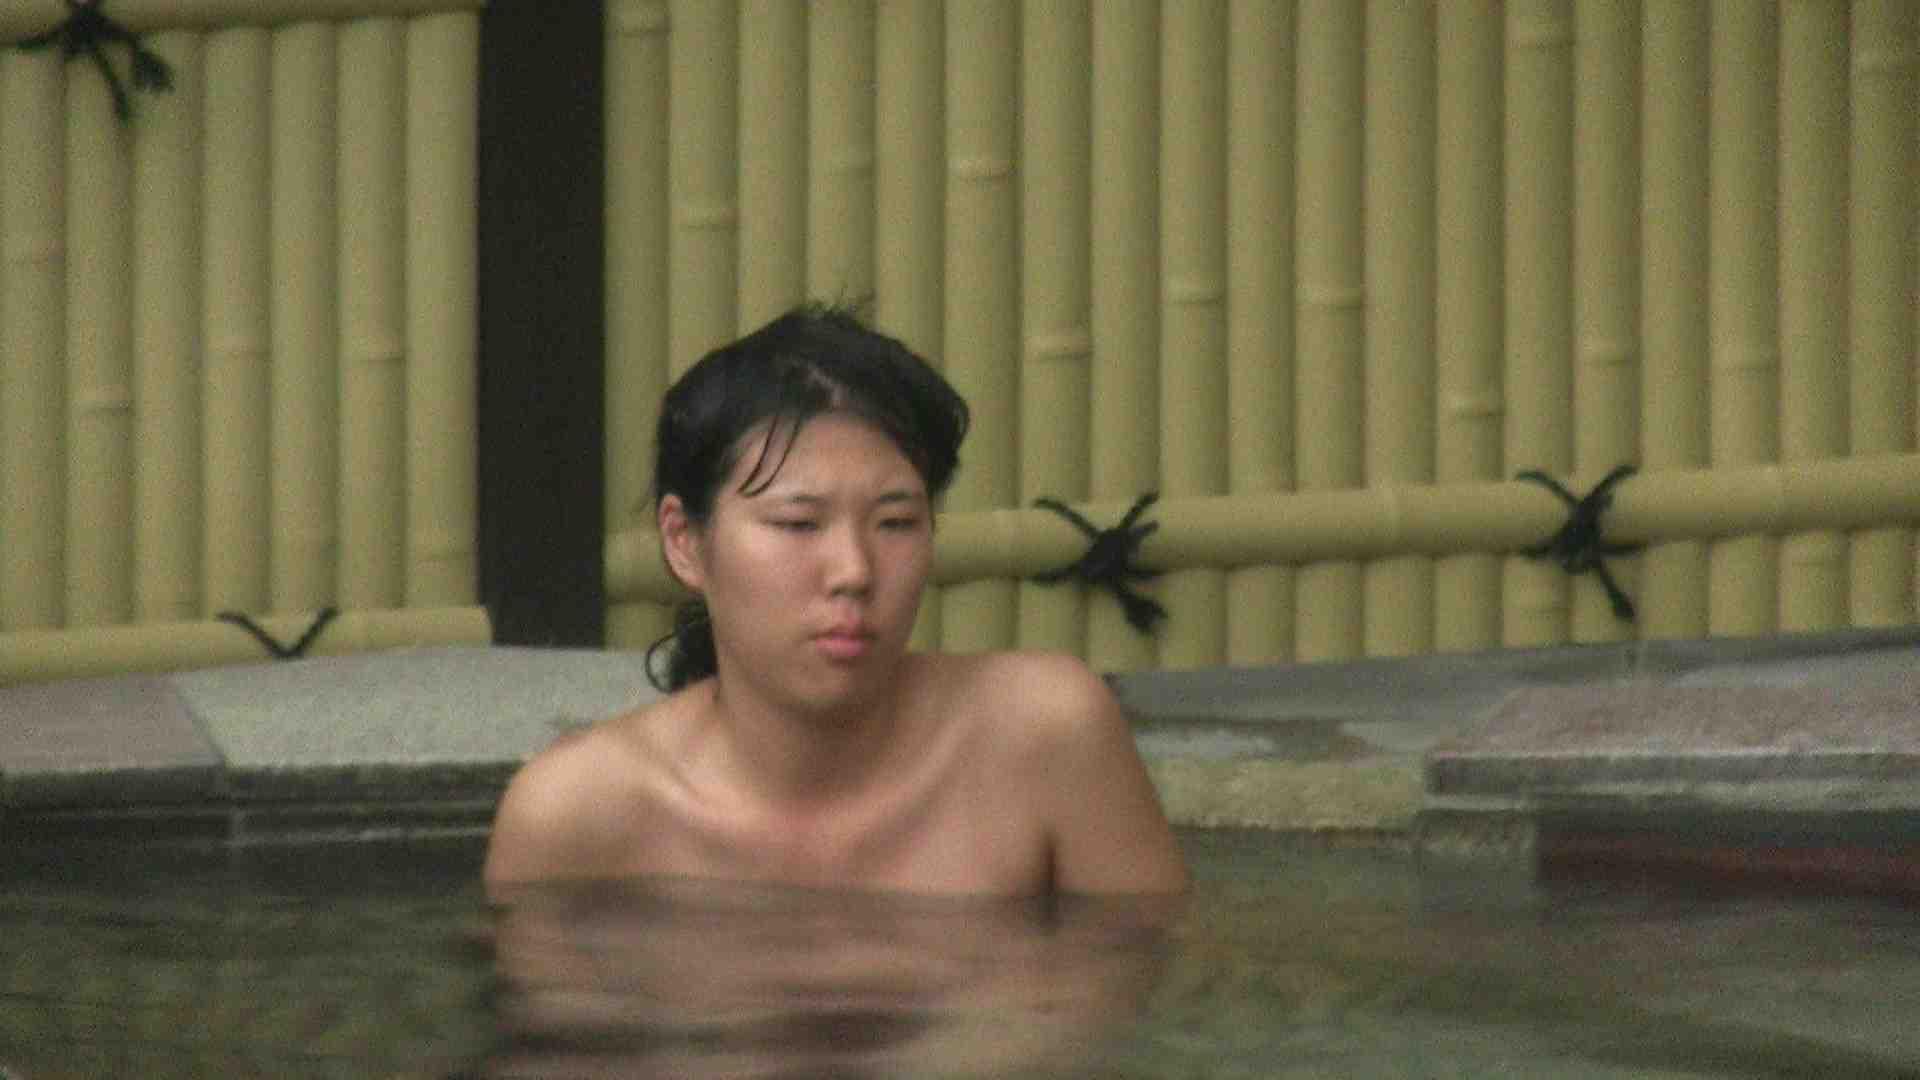 Aquaな露天風呂Vol.215 綺麗なOLたち  106枚 96